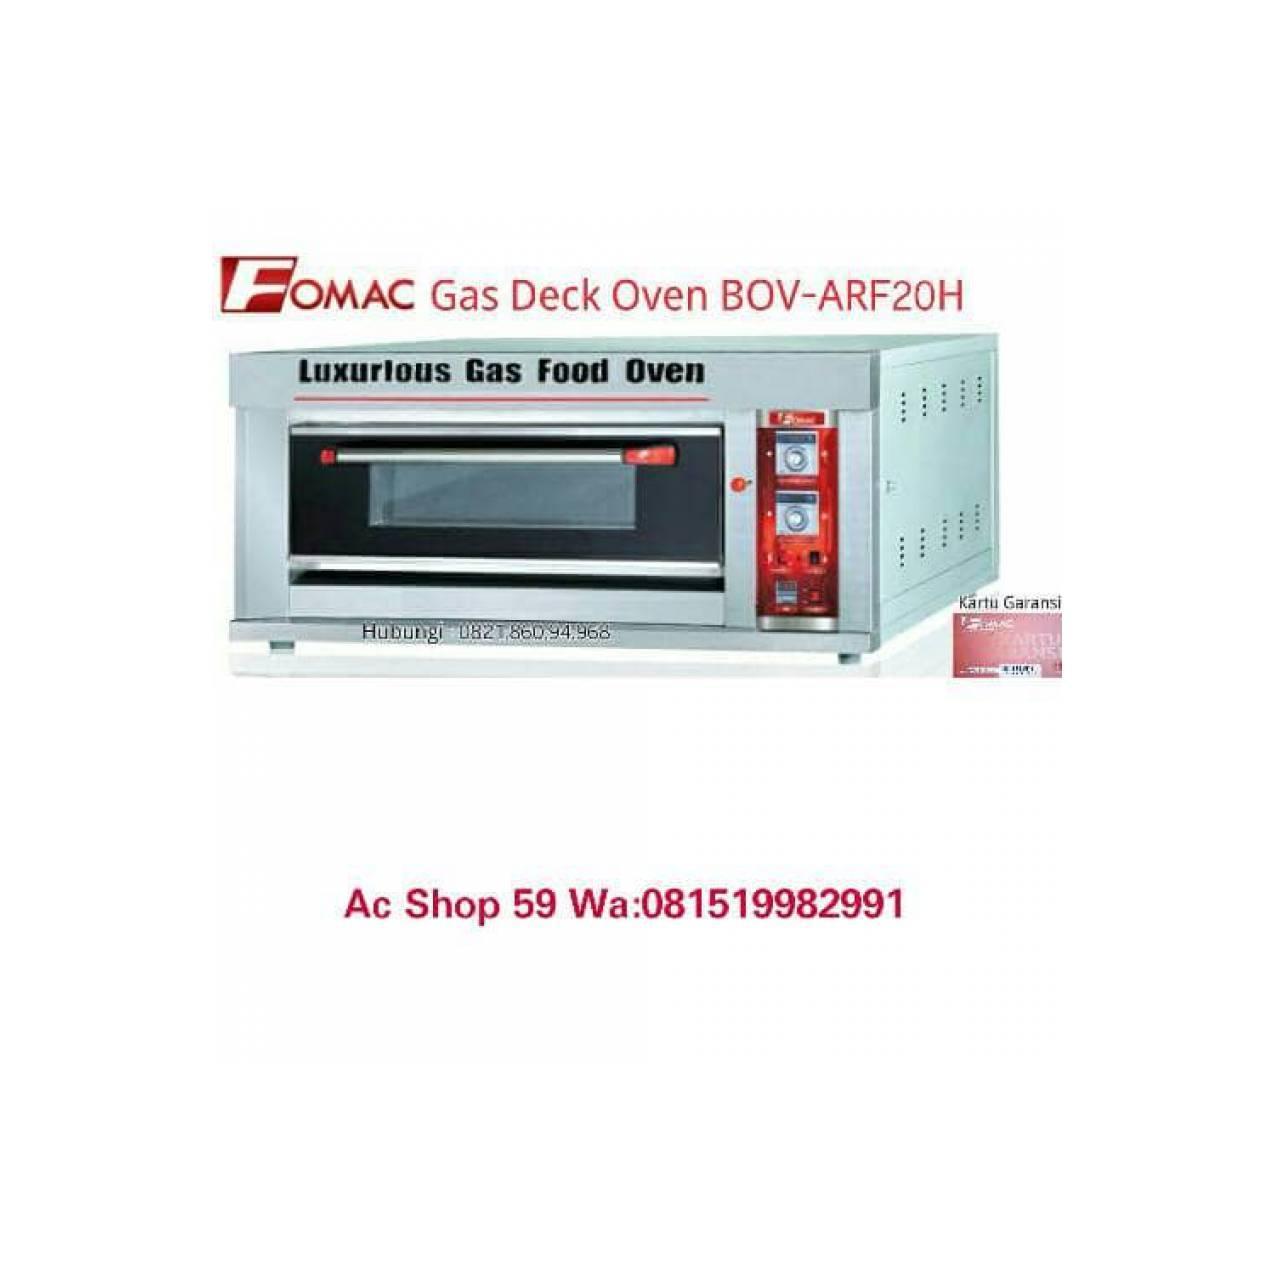 OVEN ROTI GAS FOMAC ARF-20H DECK OVEN BOV LUXURIOS GAS FOOD